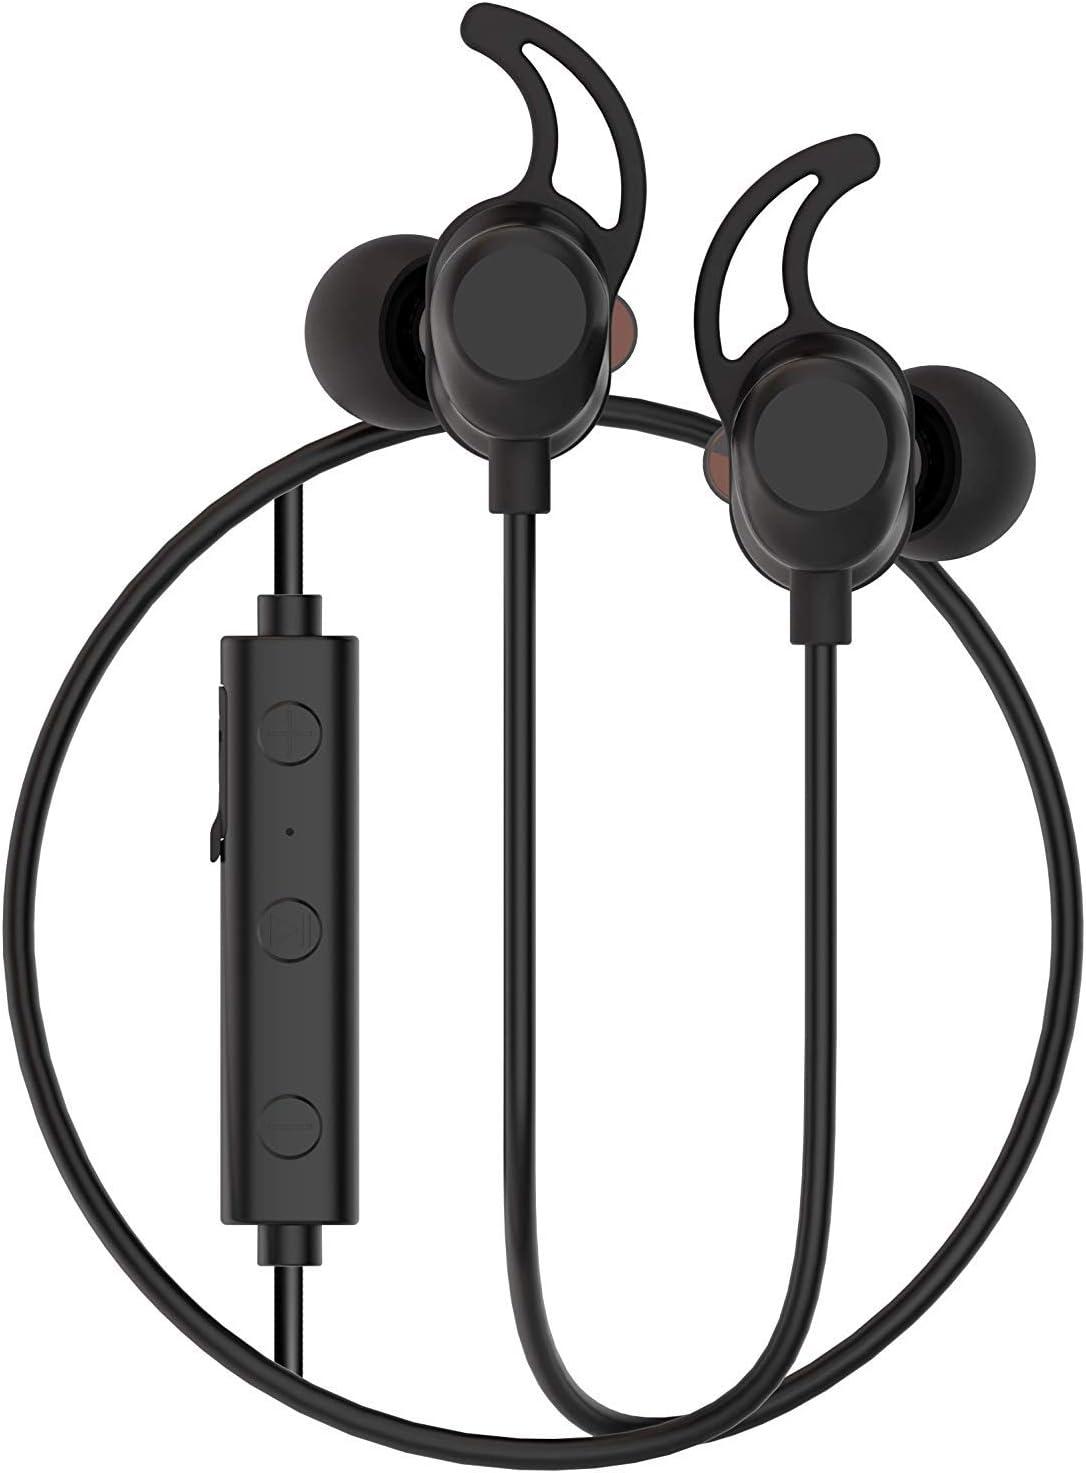 Force Audio Twin – Dual Driver Bluetooth V4.2 Wireless In Ear Monitoring Headphones with Dekoni Audio Bulletz Memory Foam Ear Tips / Built In Microphone